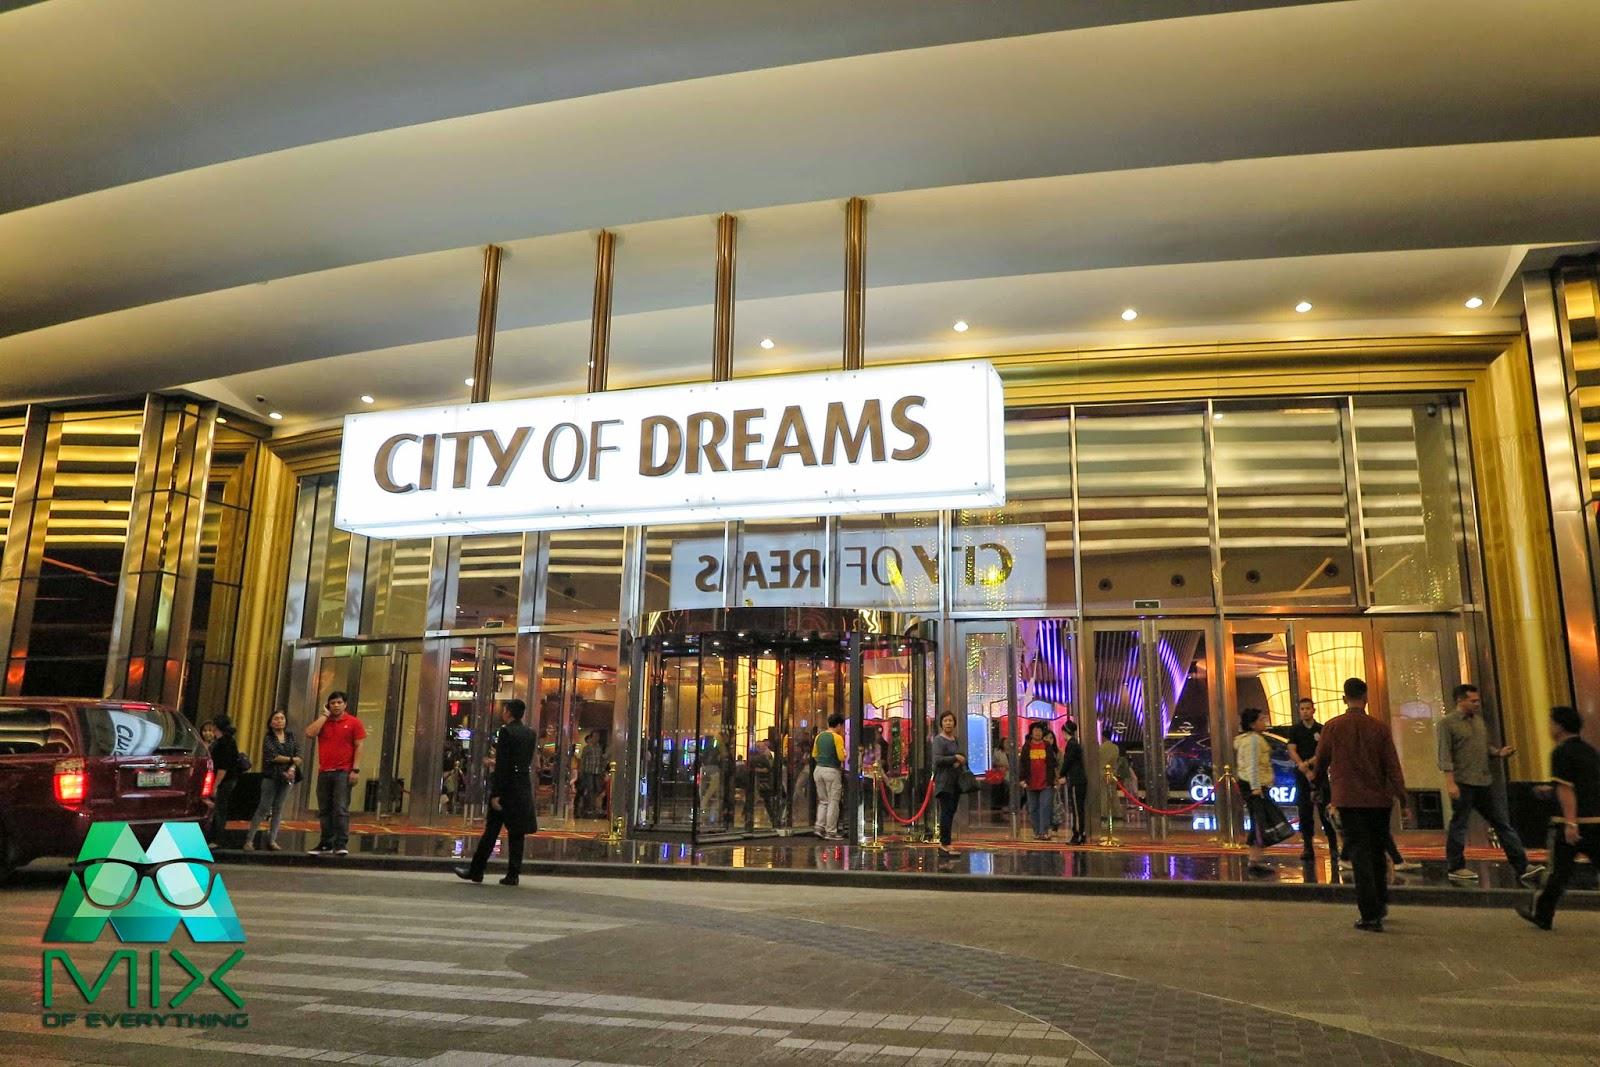 city of dreams manila Philippines - manila-city of dreams manila aug 16, 2018 apply   save jobsave  job sous chef, pastry philippines - manila-city of dreams manila aug 3.